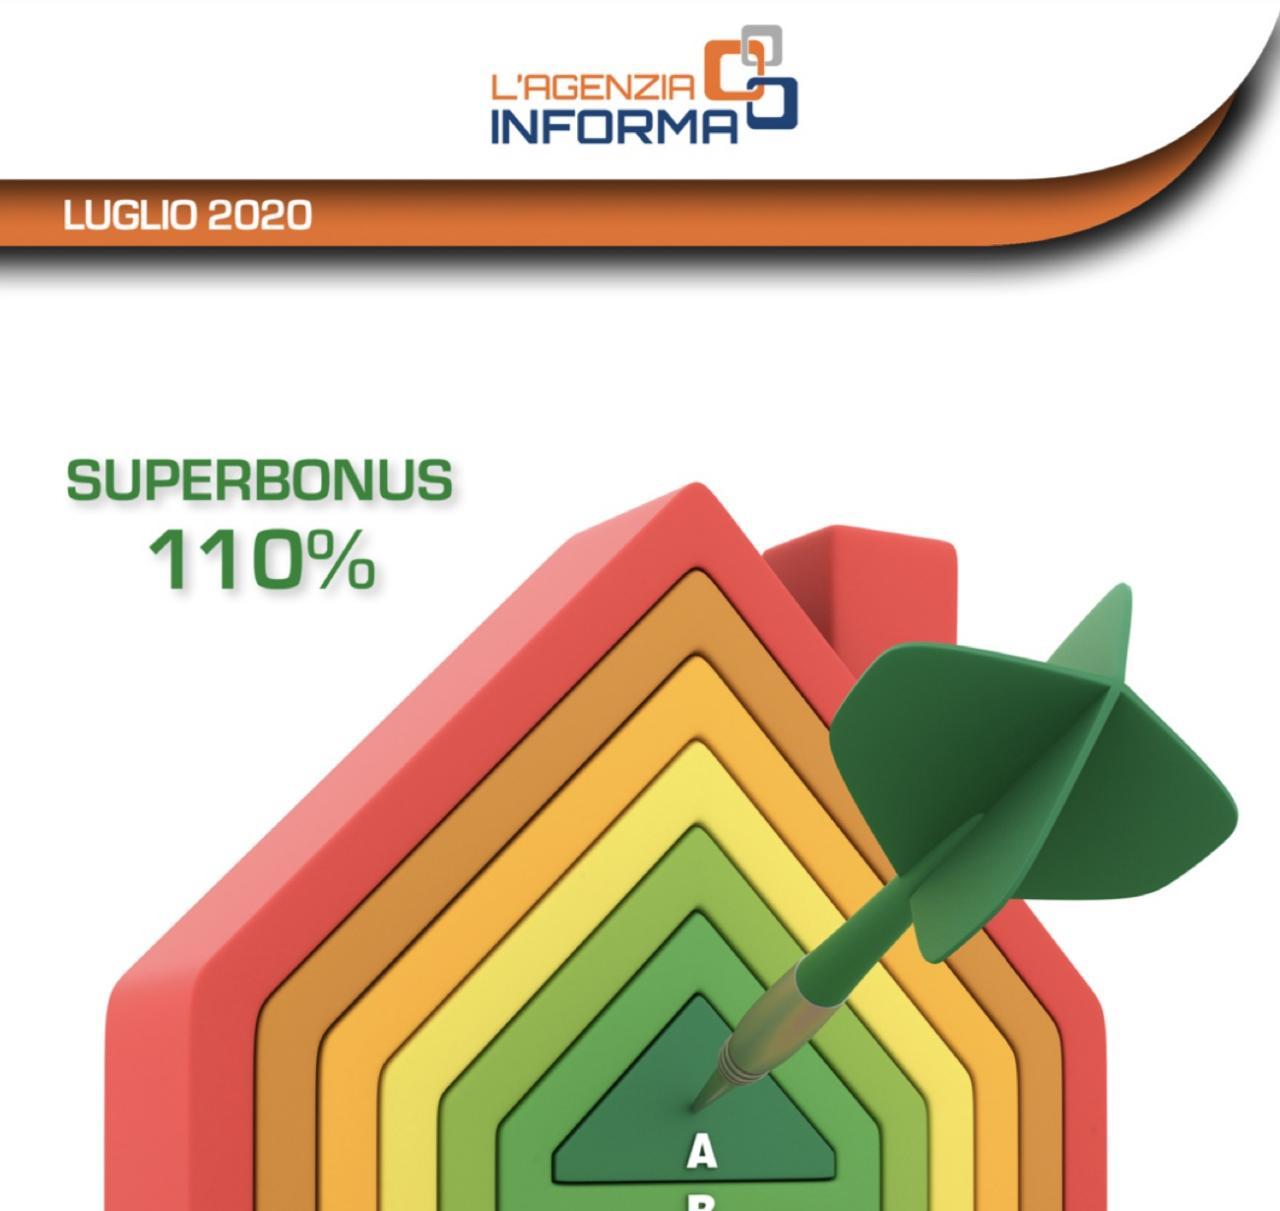 SUPERBONUS 110% - guida agenzia delle entrate